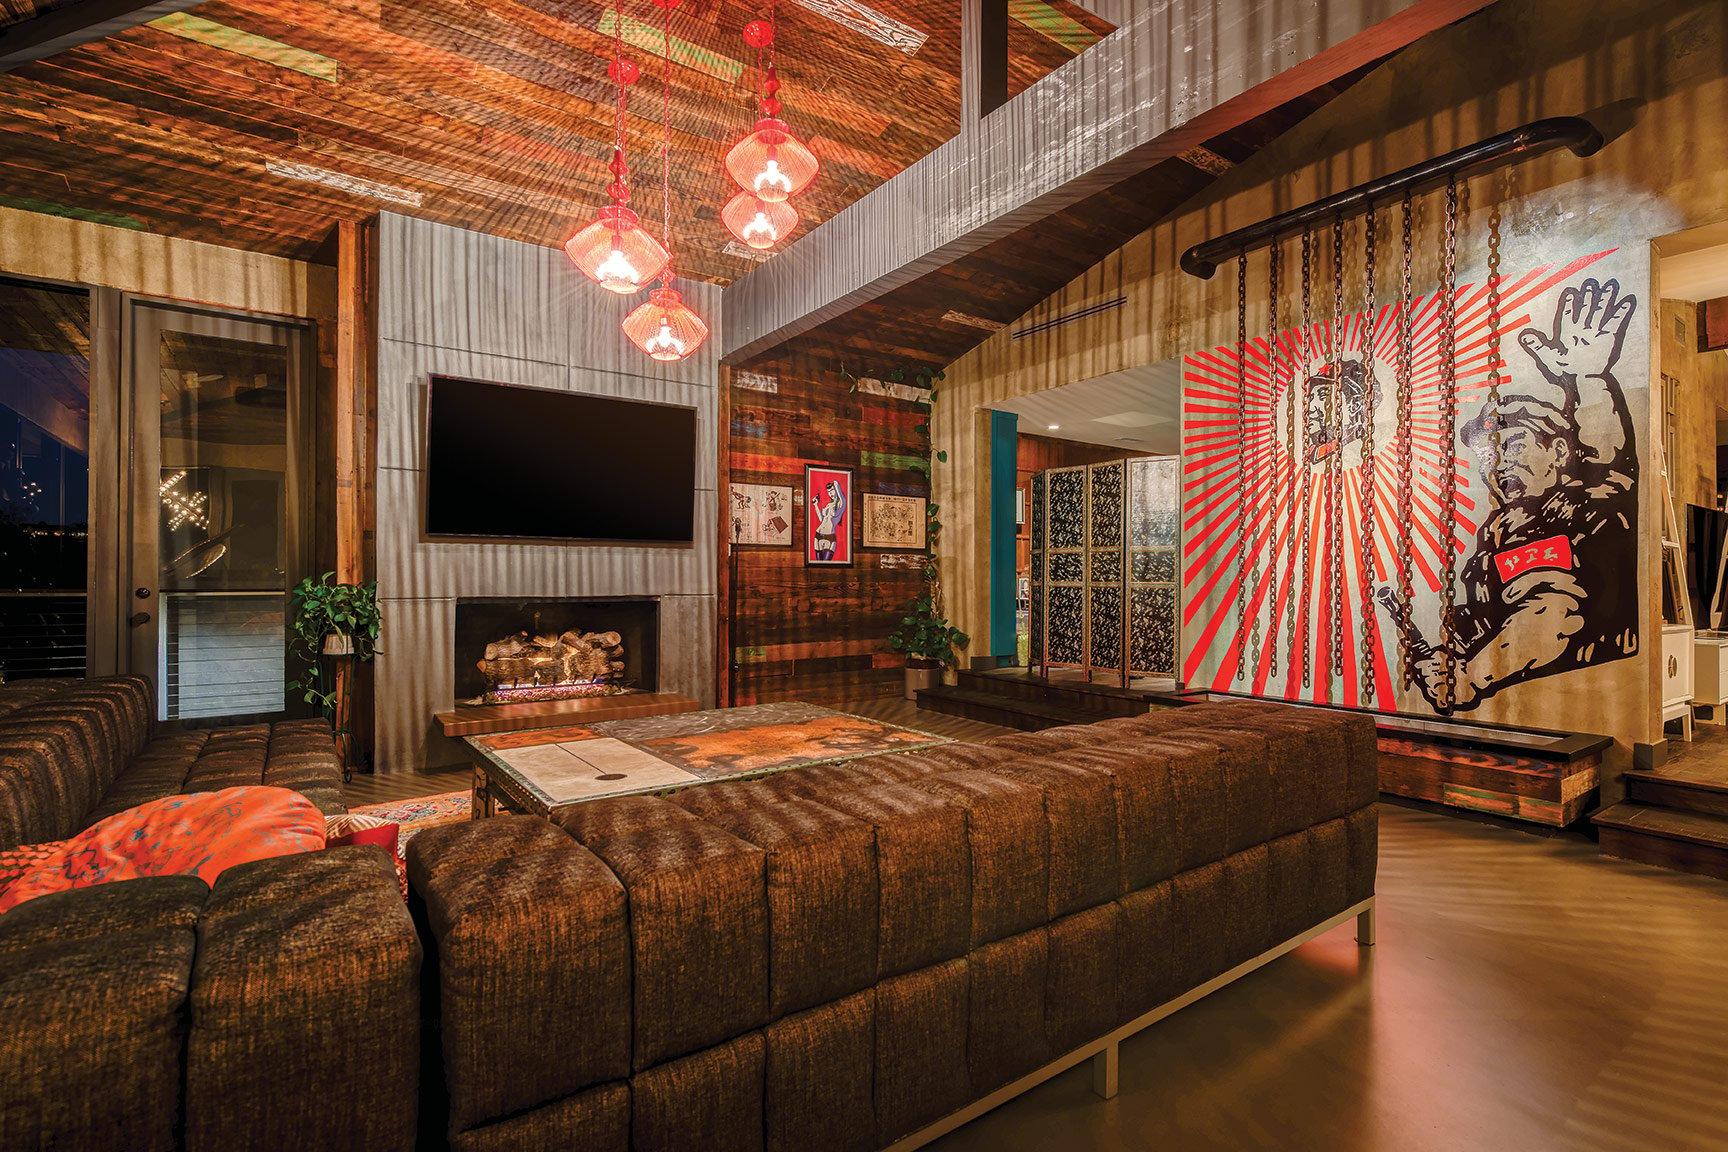 propaganda art chinese china chairman mao revolutionary design mission hills home decor